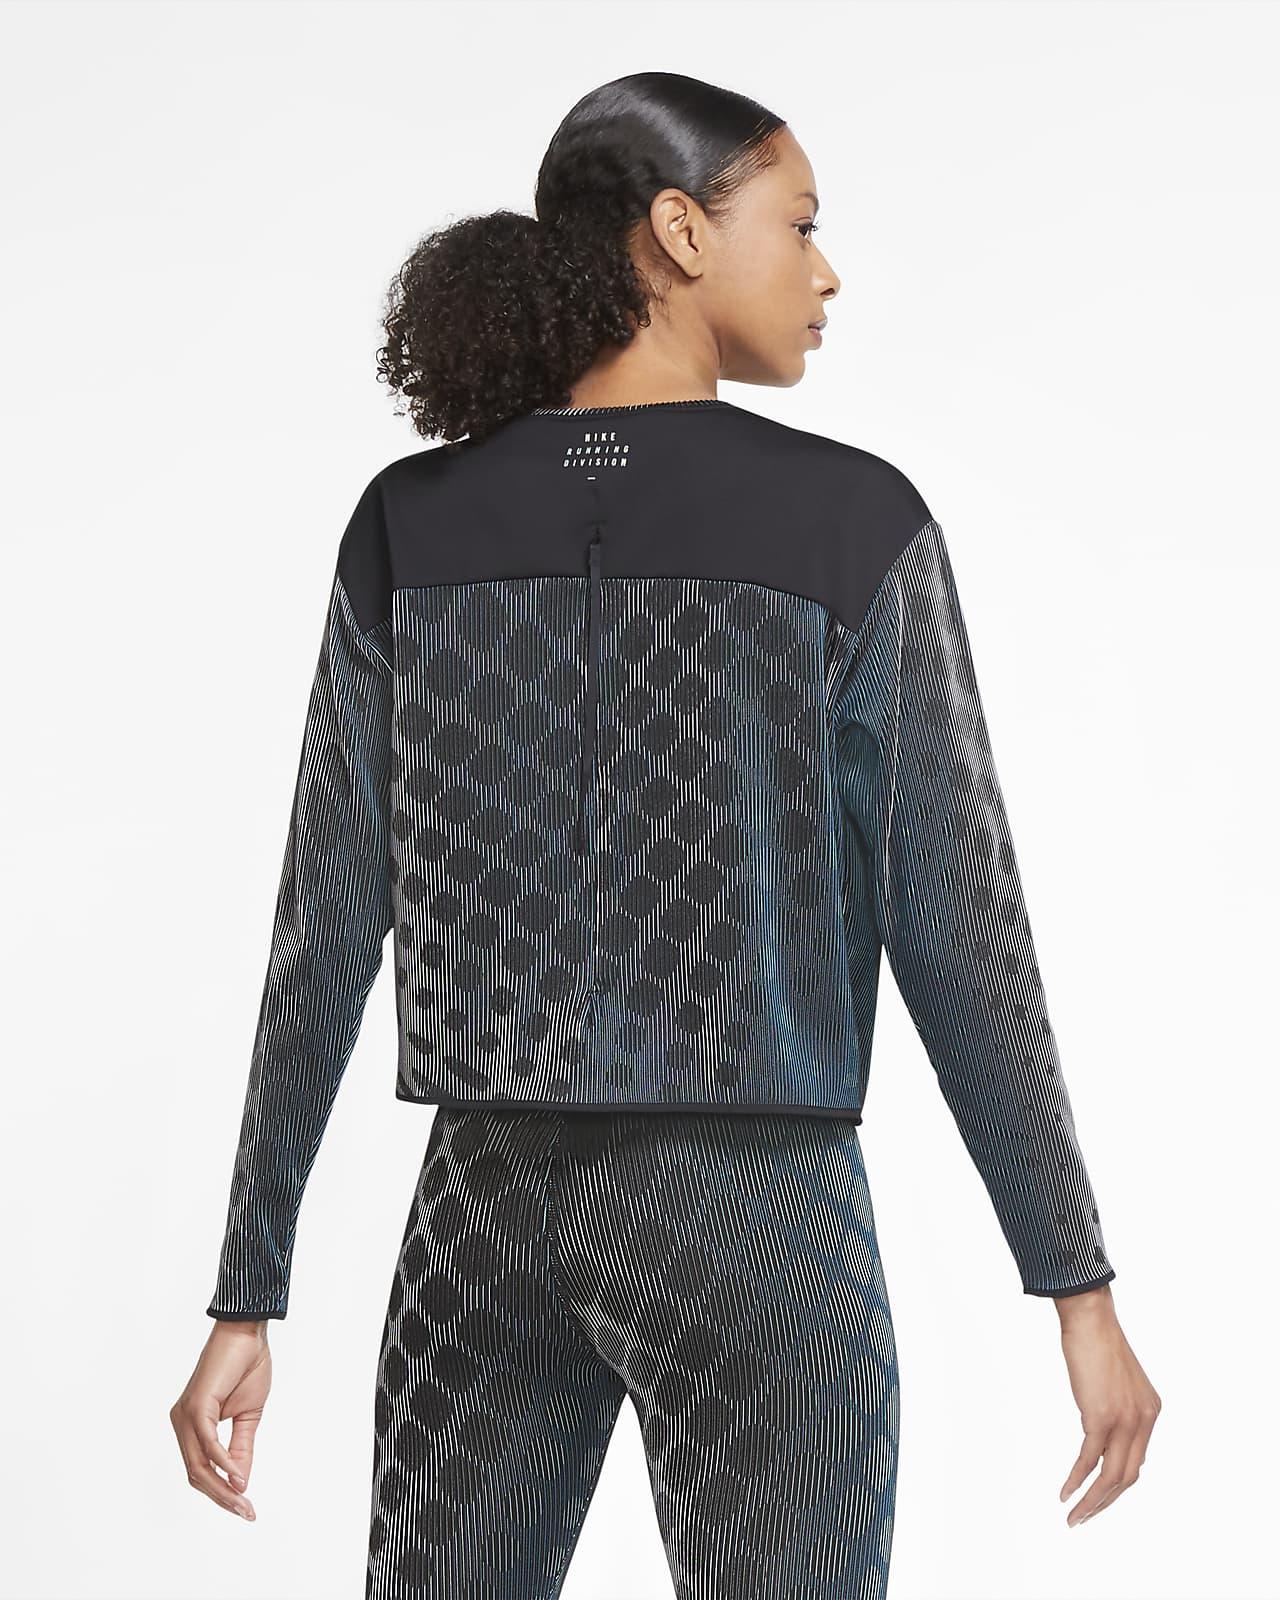 Recitar George Hanbury alguna cosa  Nike Run Division Women's Running Midlayer Top. Nike SA